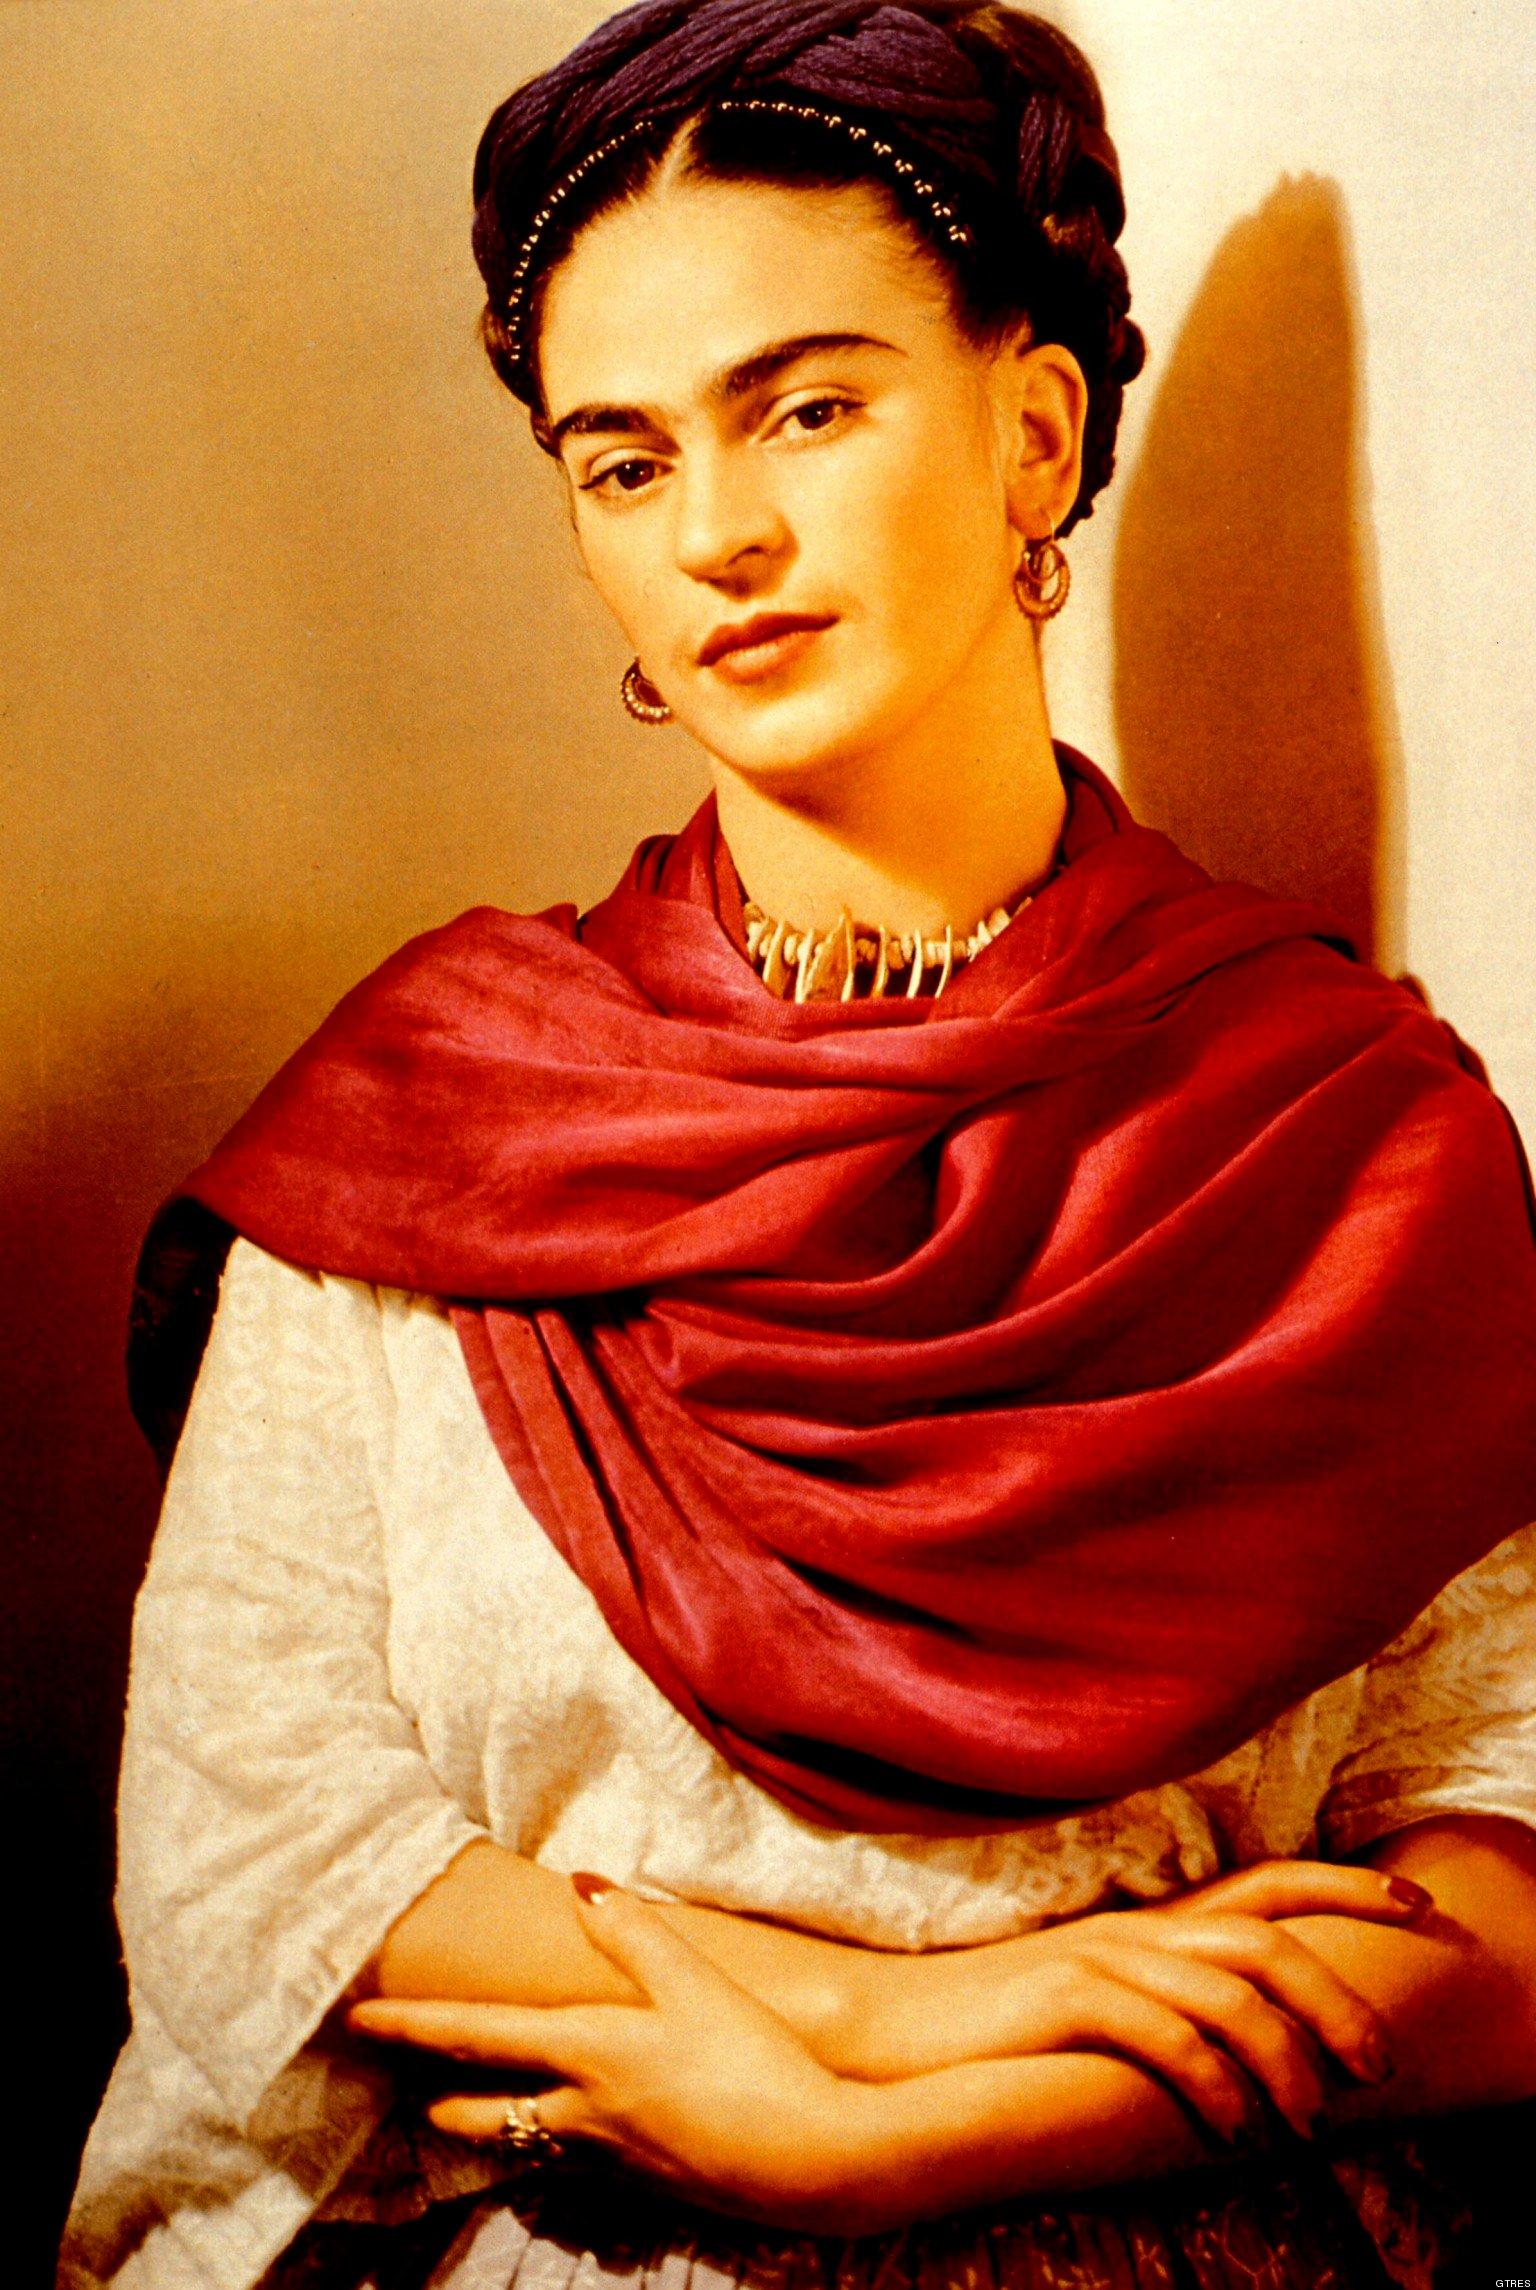 Las 12 Mejores Frases De Frida Kahlo Que Te Inspiraran